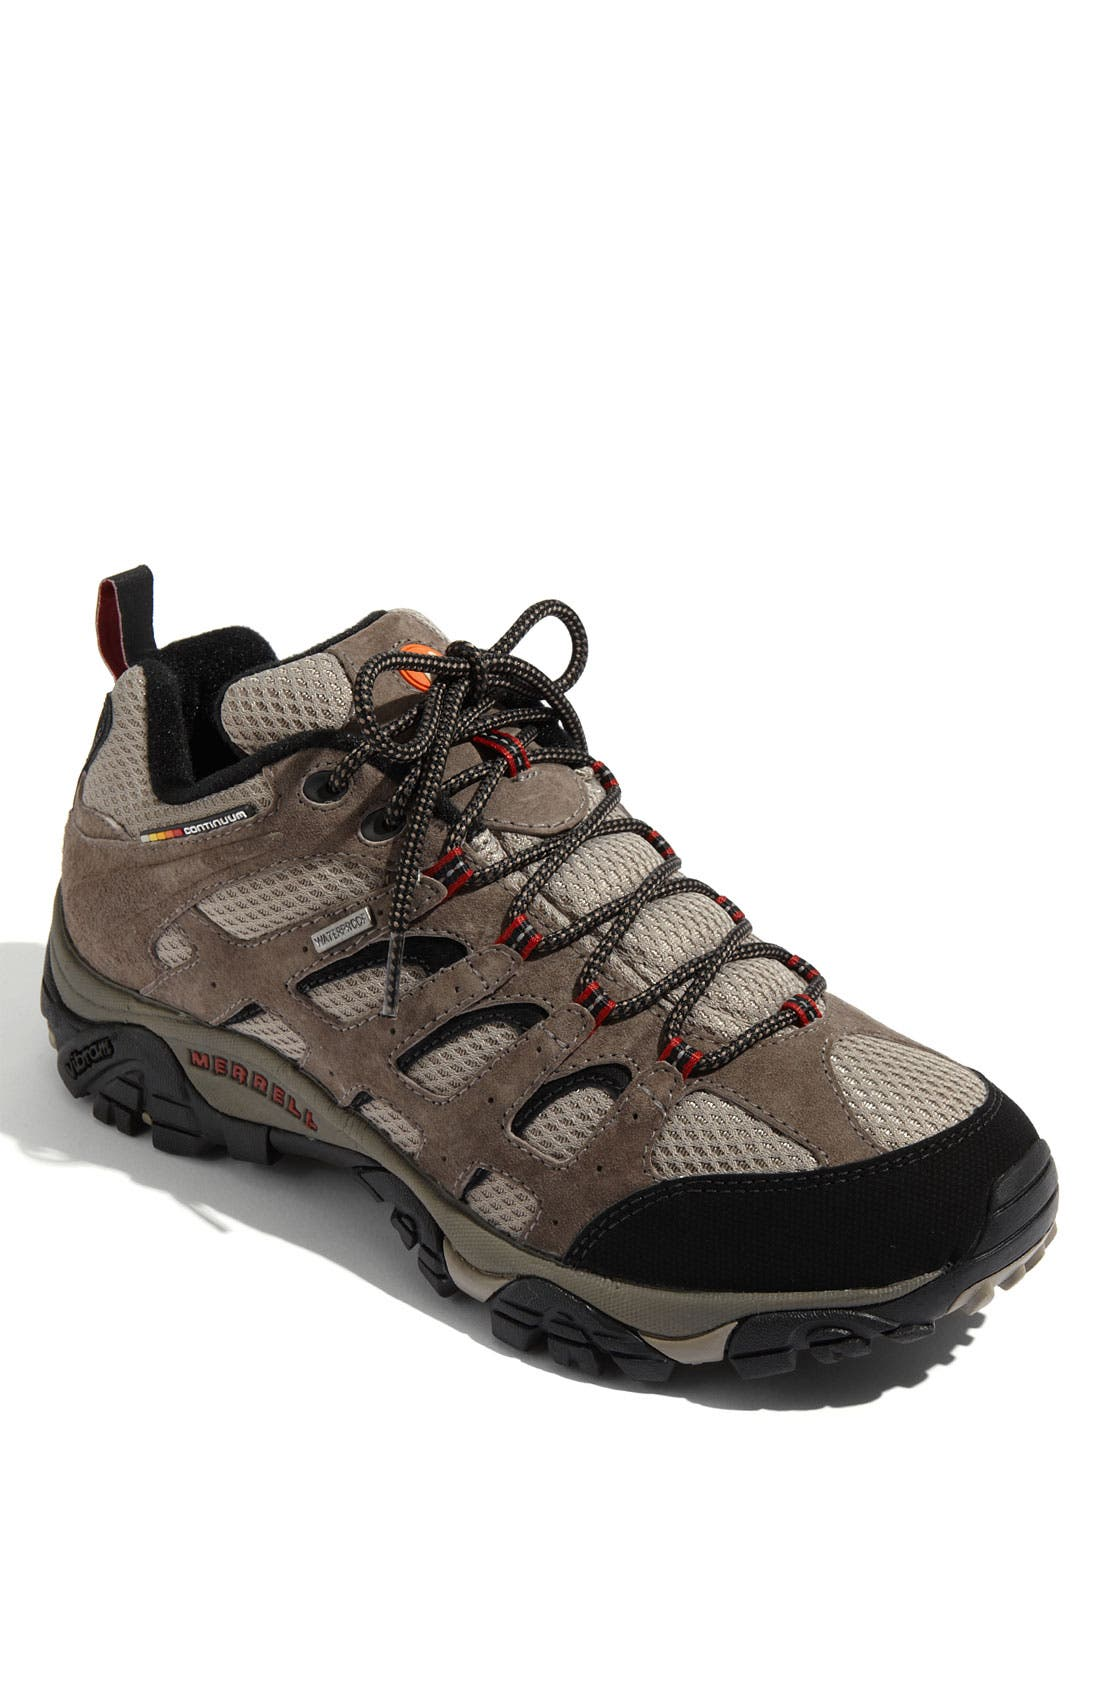 Alternate Image 1 Selected - Merrell 'Moab' Waterproof Hiking Shoe (Men)